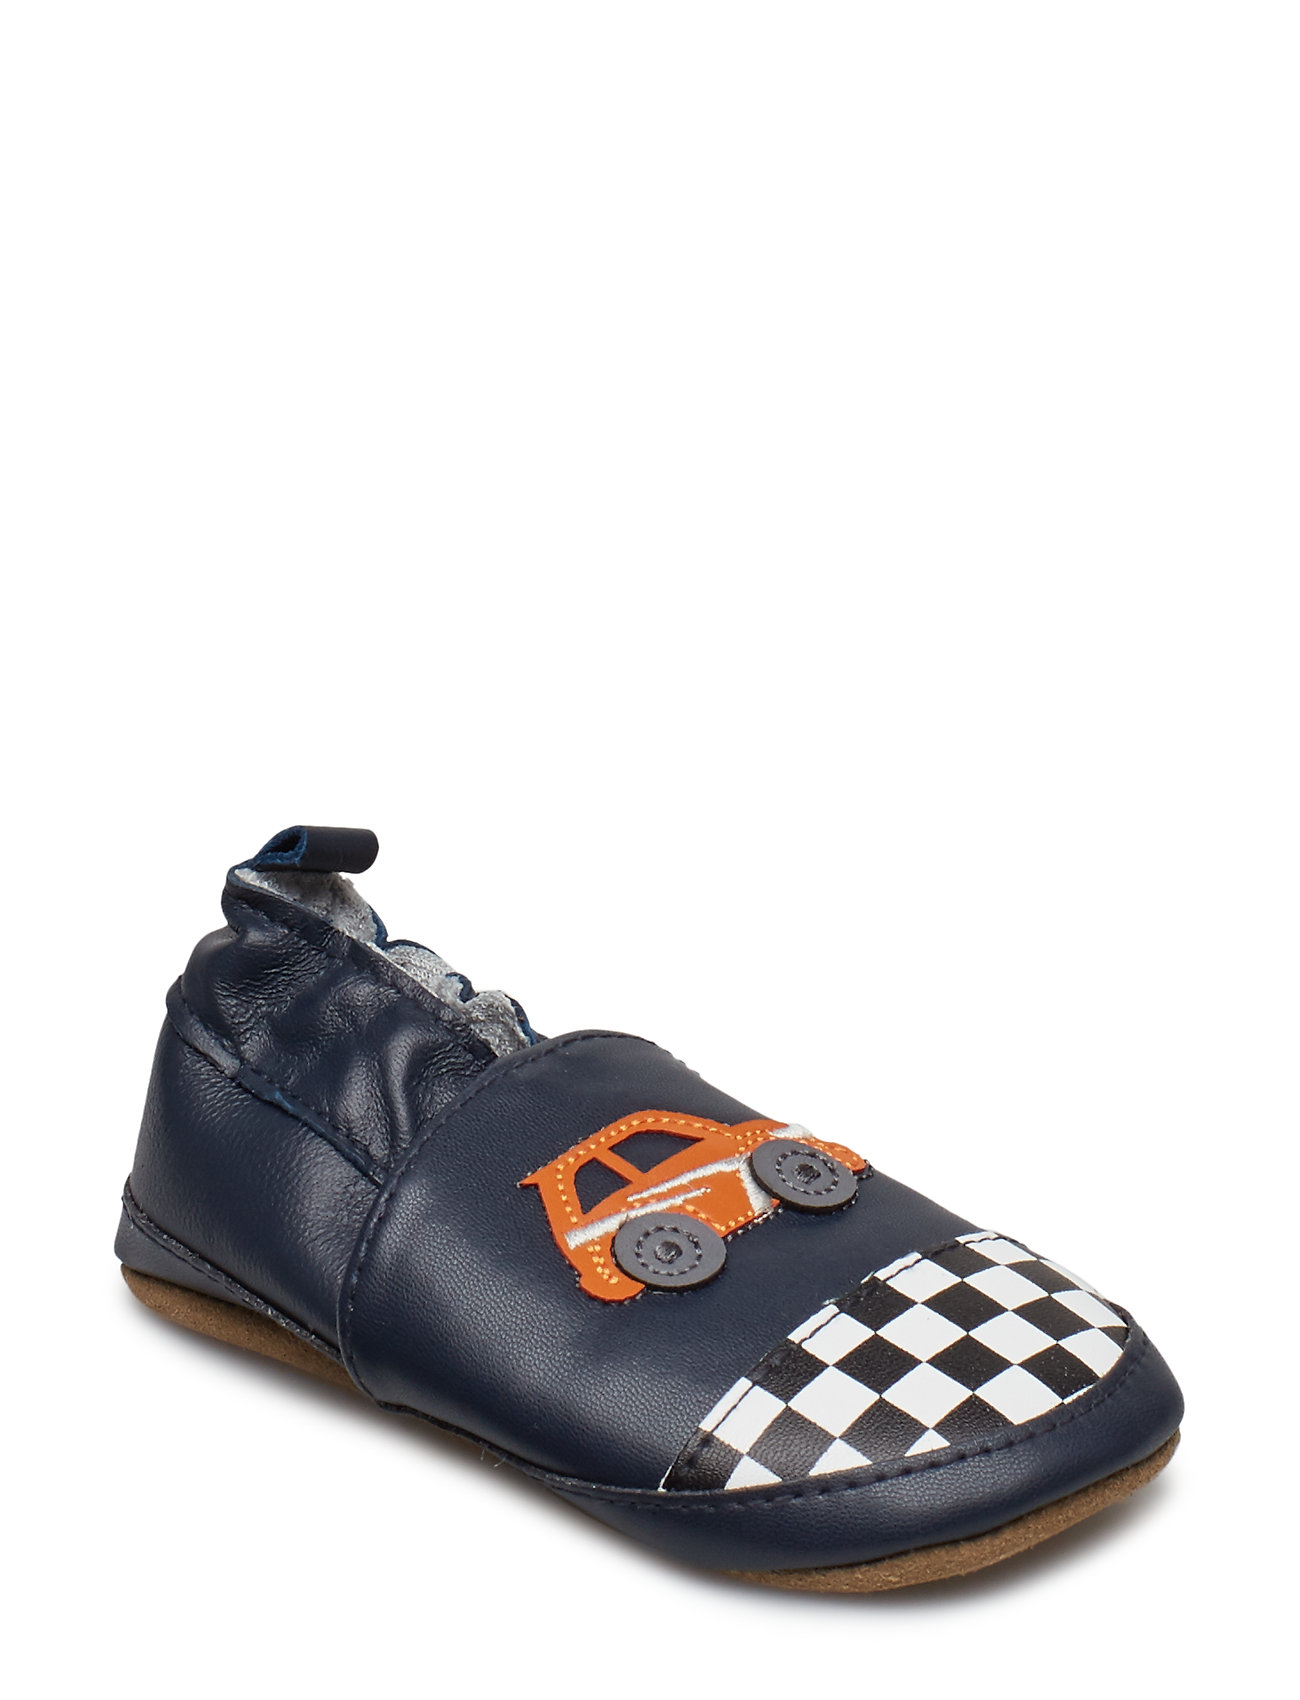 a174f7555a1a leather shoe - race car